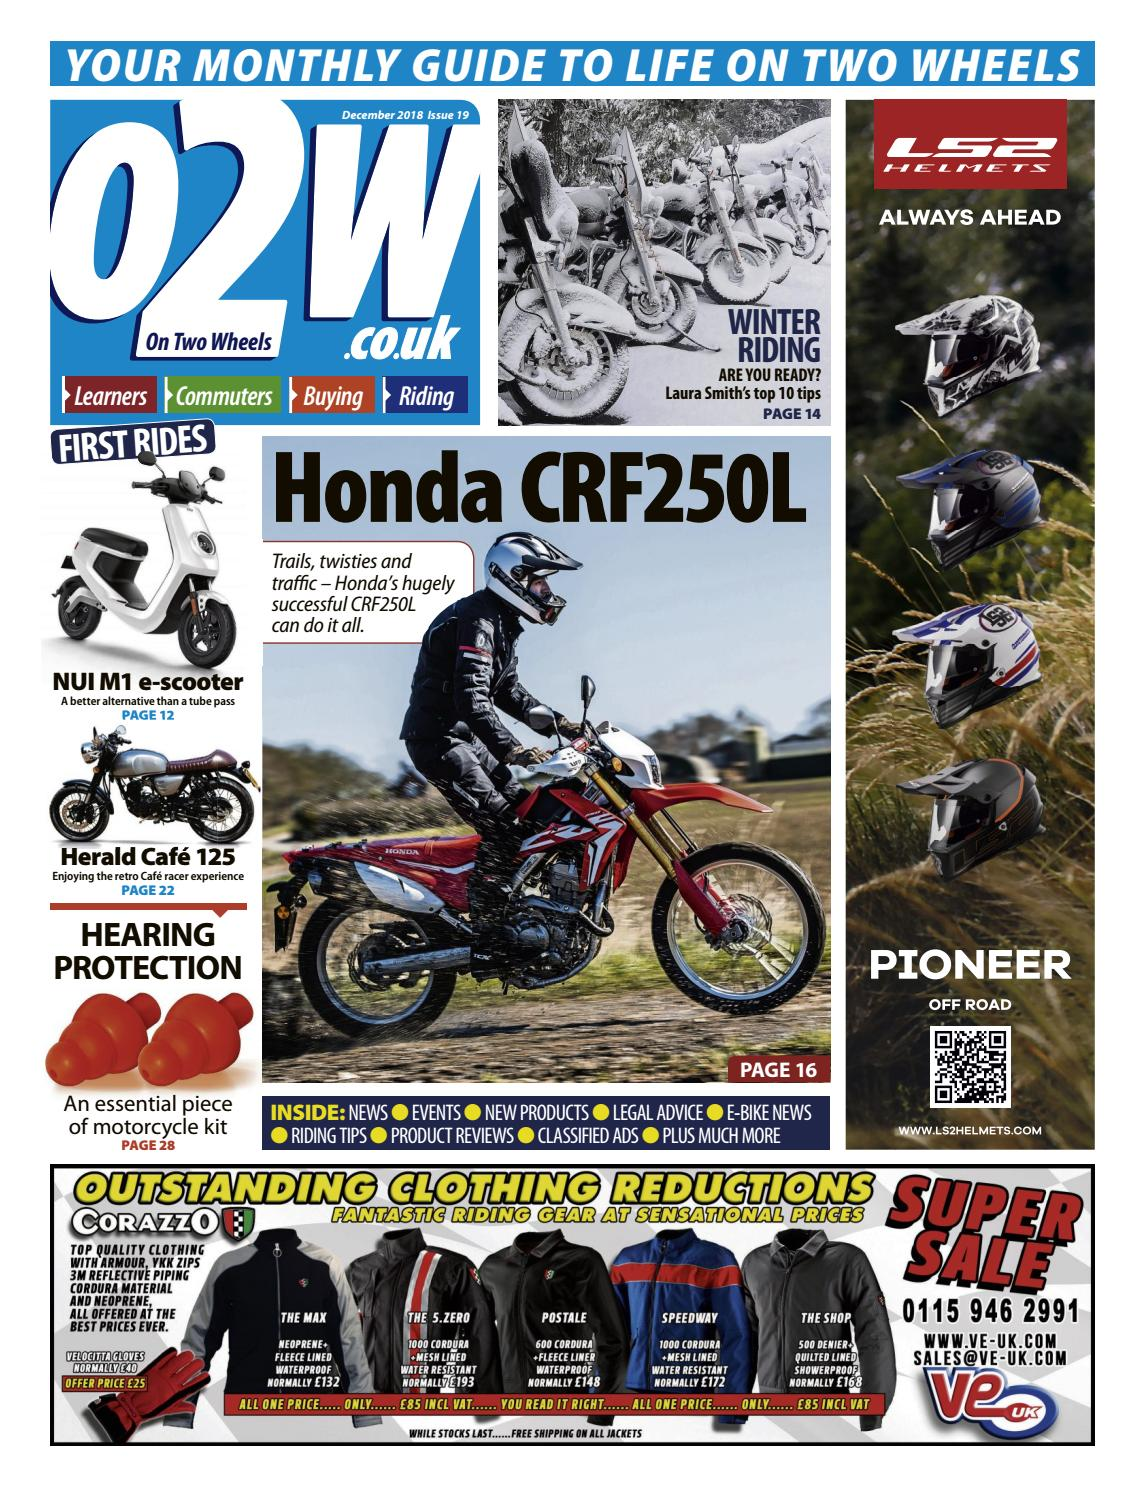 MPW Blade Supermoto//motocross Motorcycle Handguards White